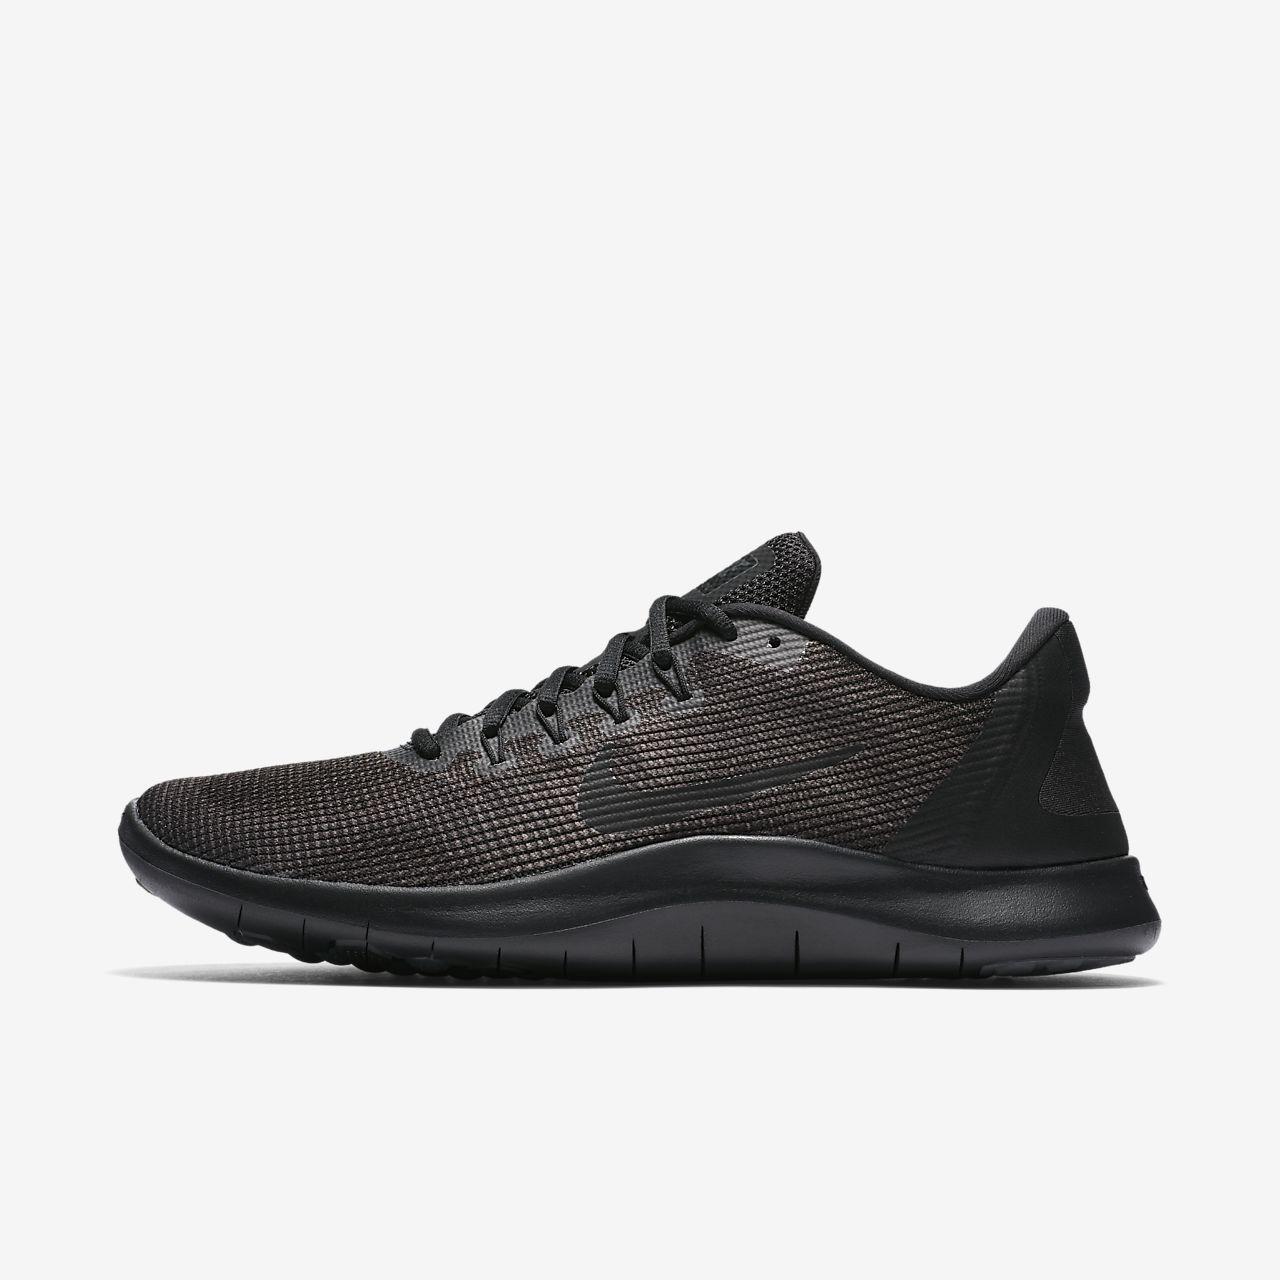 50% off good out x shopping Chaussure de running Nike Flex 2018 RN pour Homme